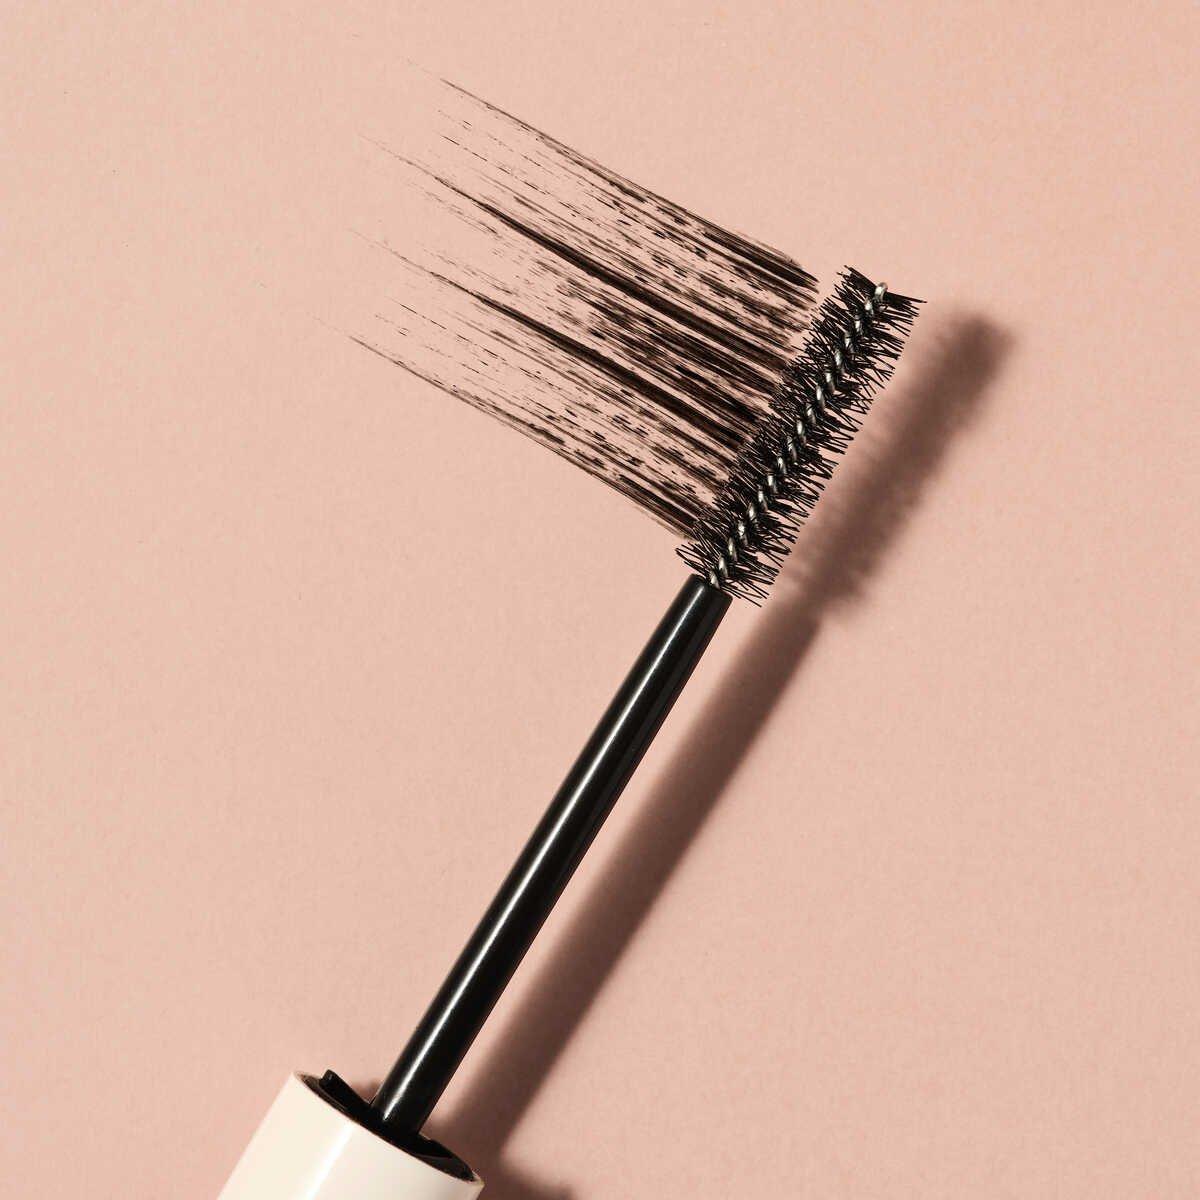 Mascara Brush 03